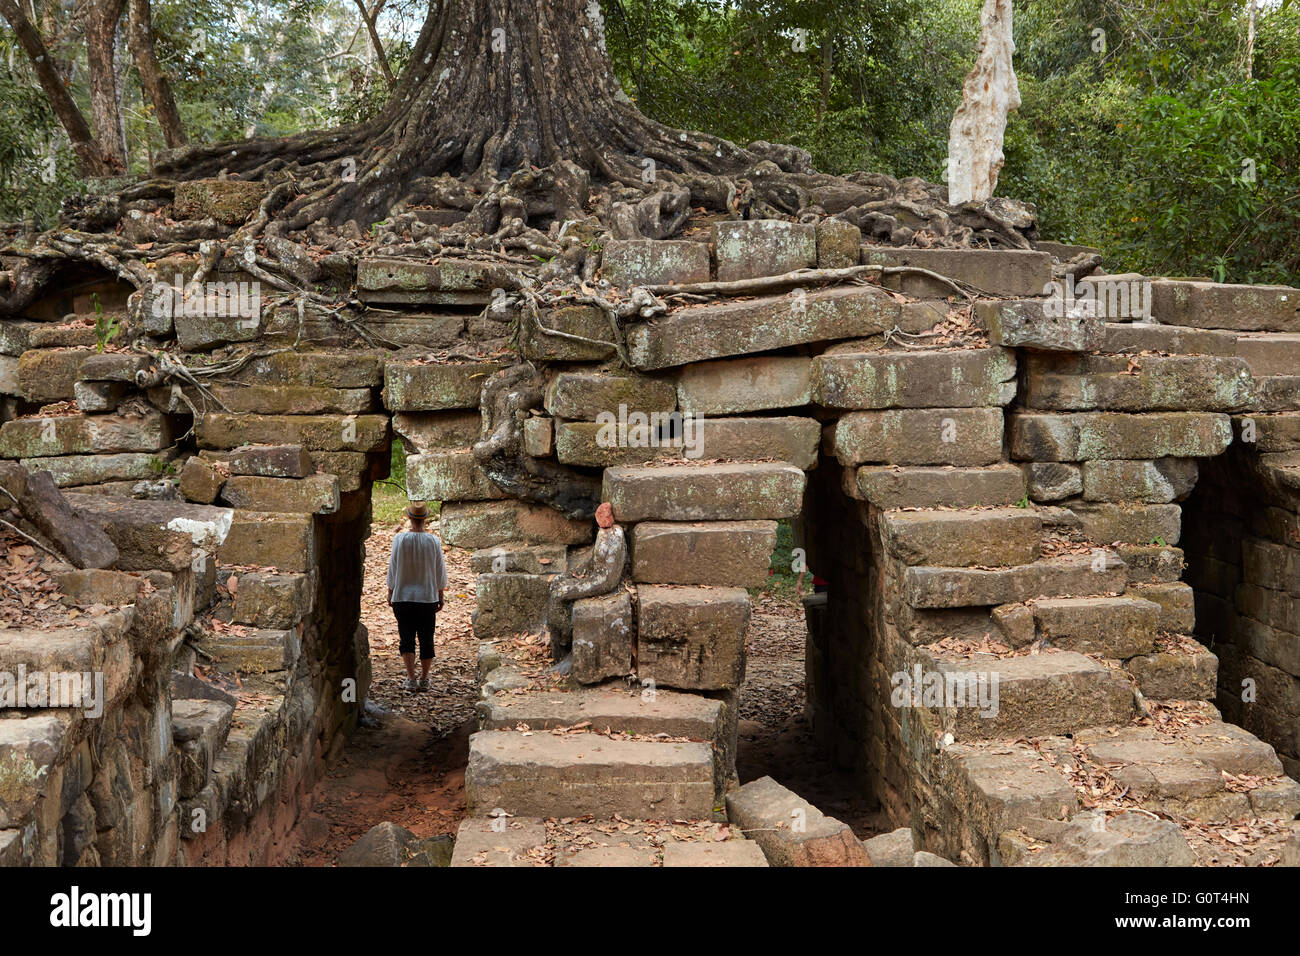 Tourist under tree growing on ruins of ancient Spean Thmor bridge, Angkor World Heritage Site, Siem Reap, Cambodia - Stock Image